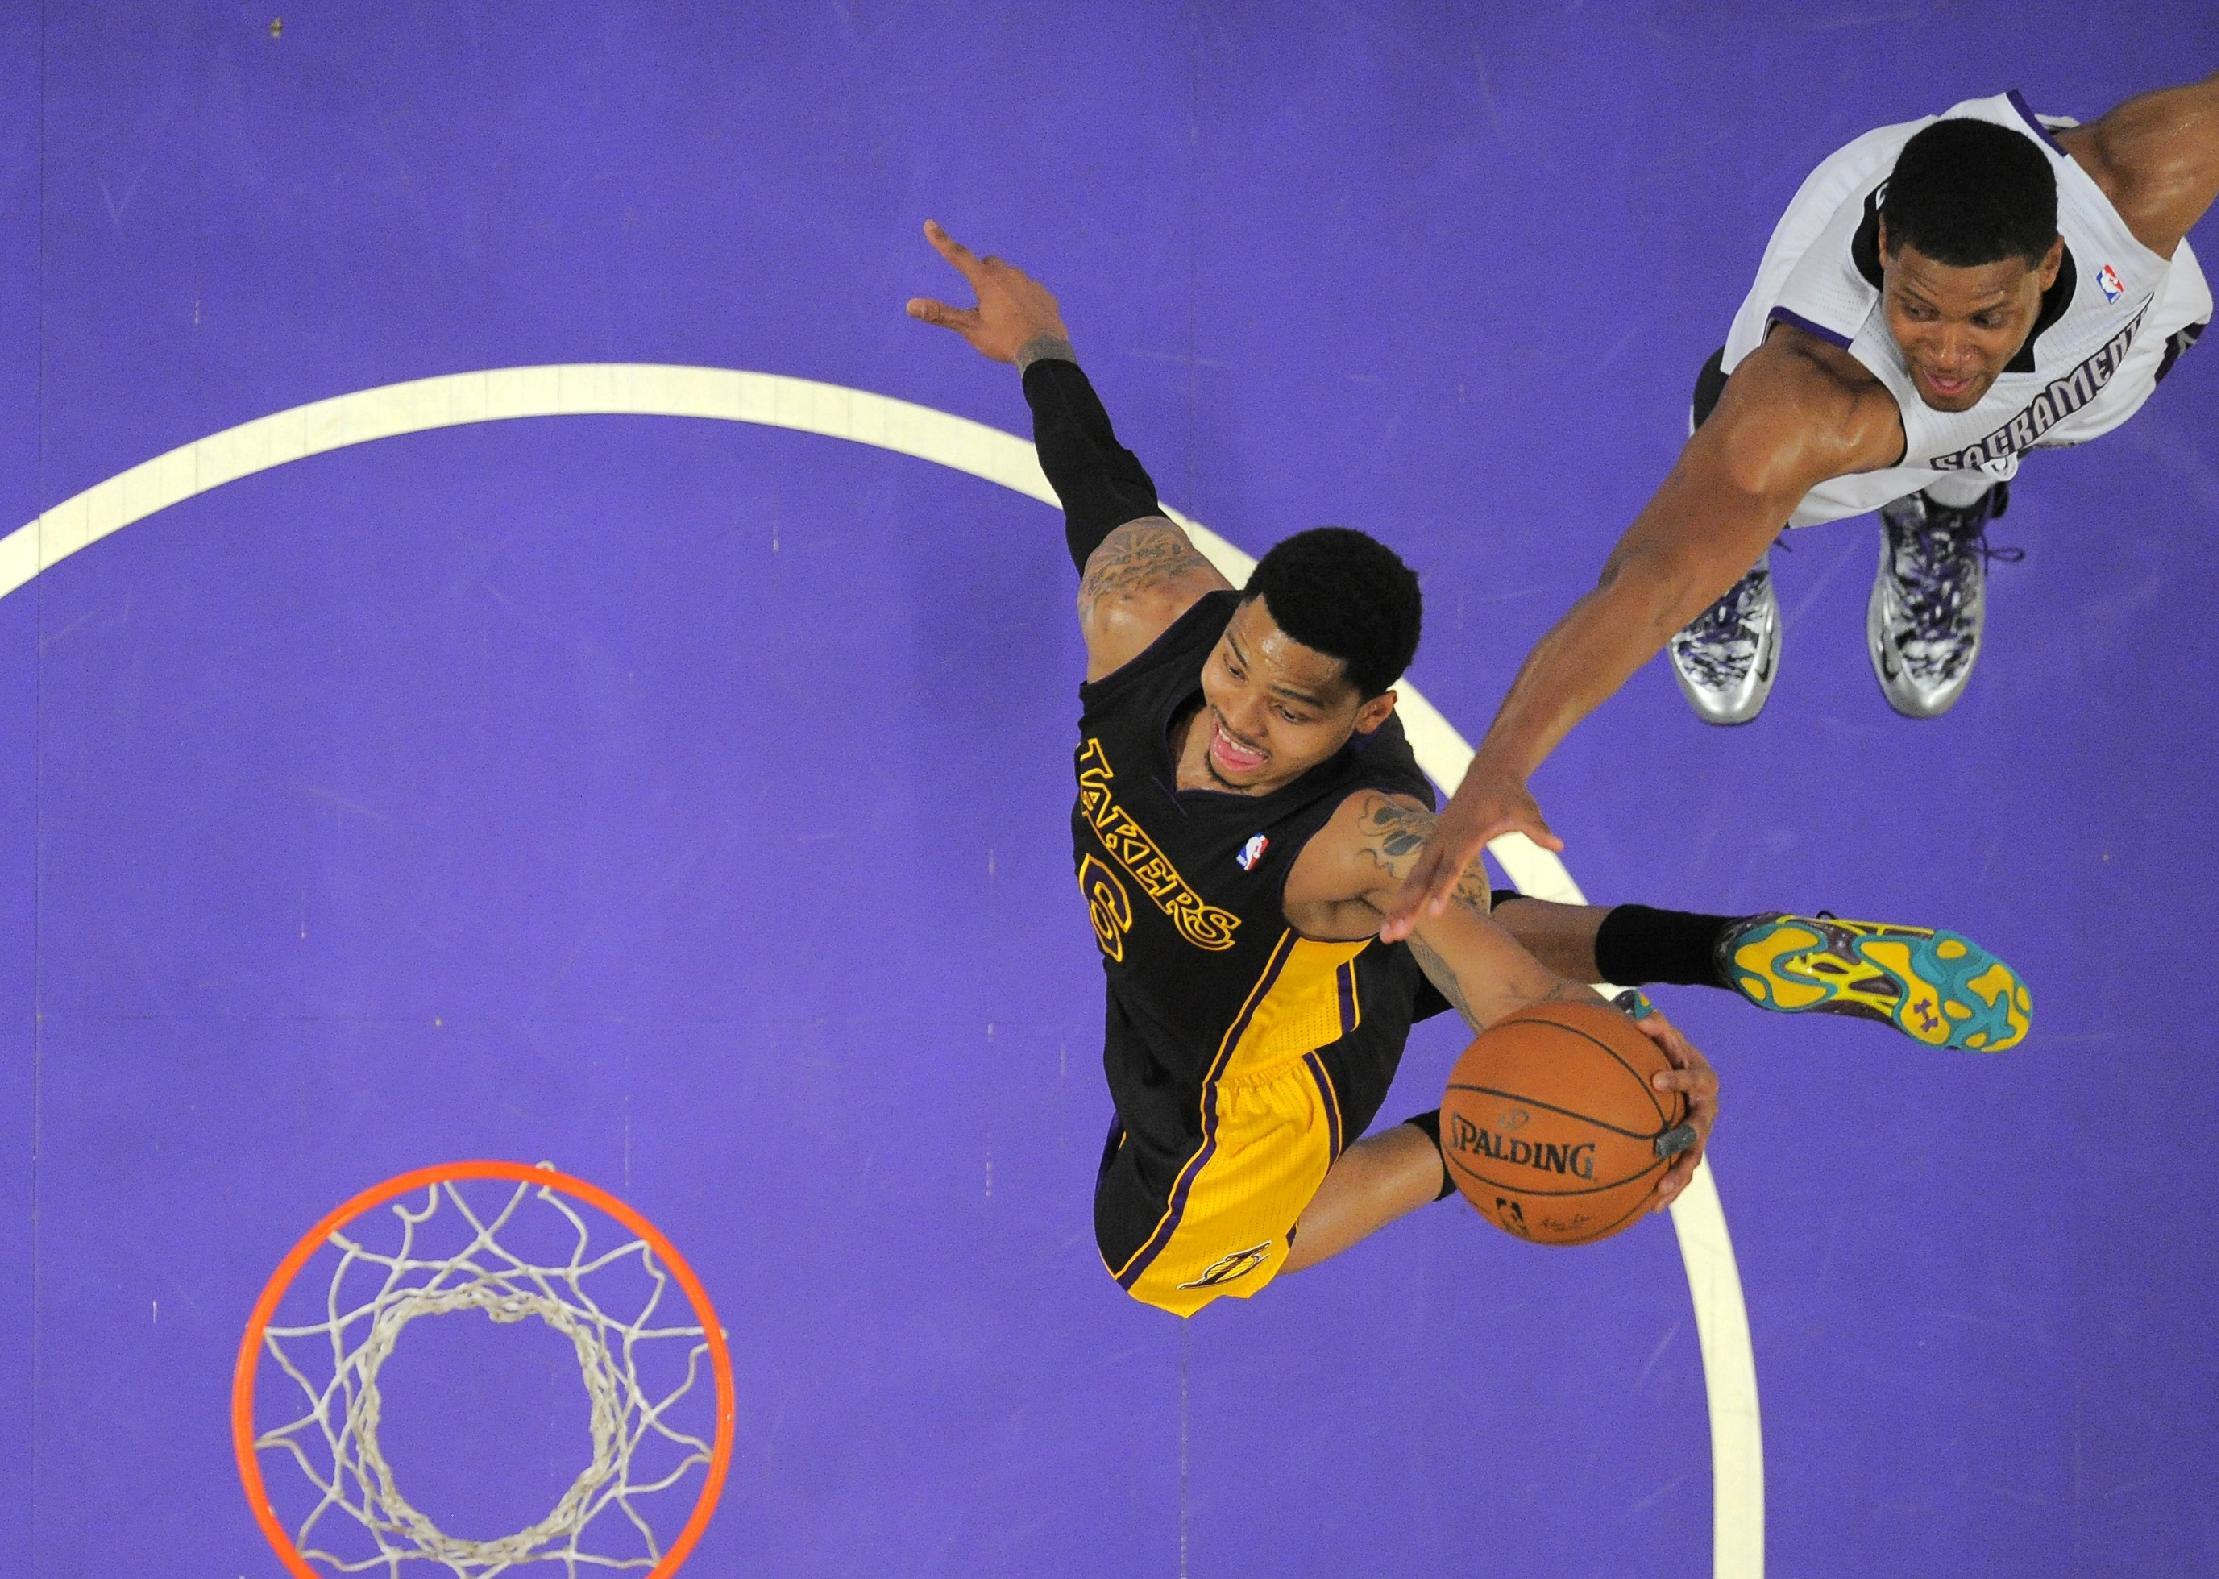 Farmar scores career-high 30 as Lakers beat Kings